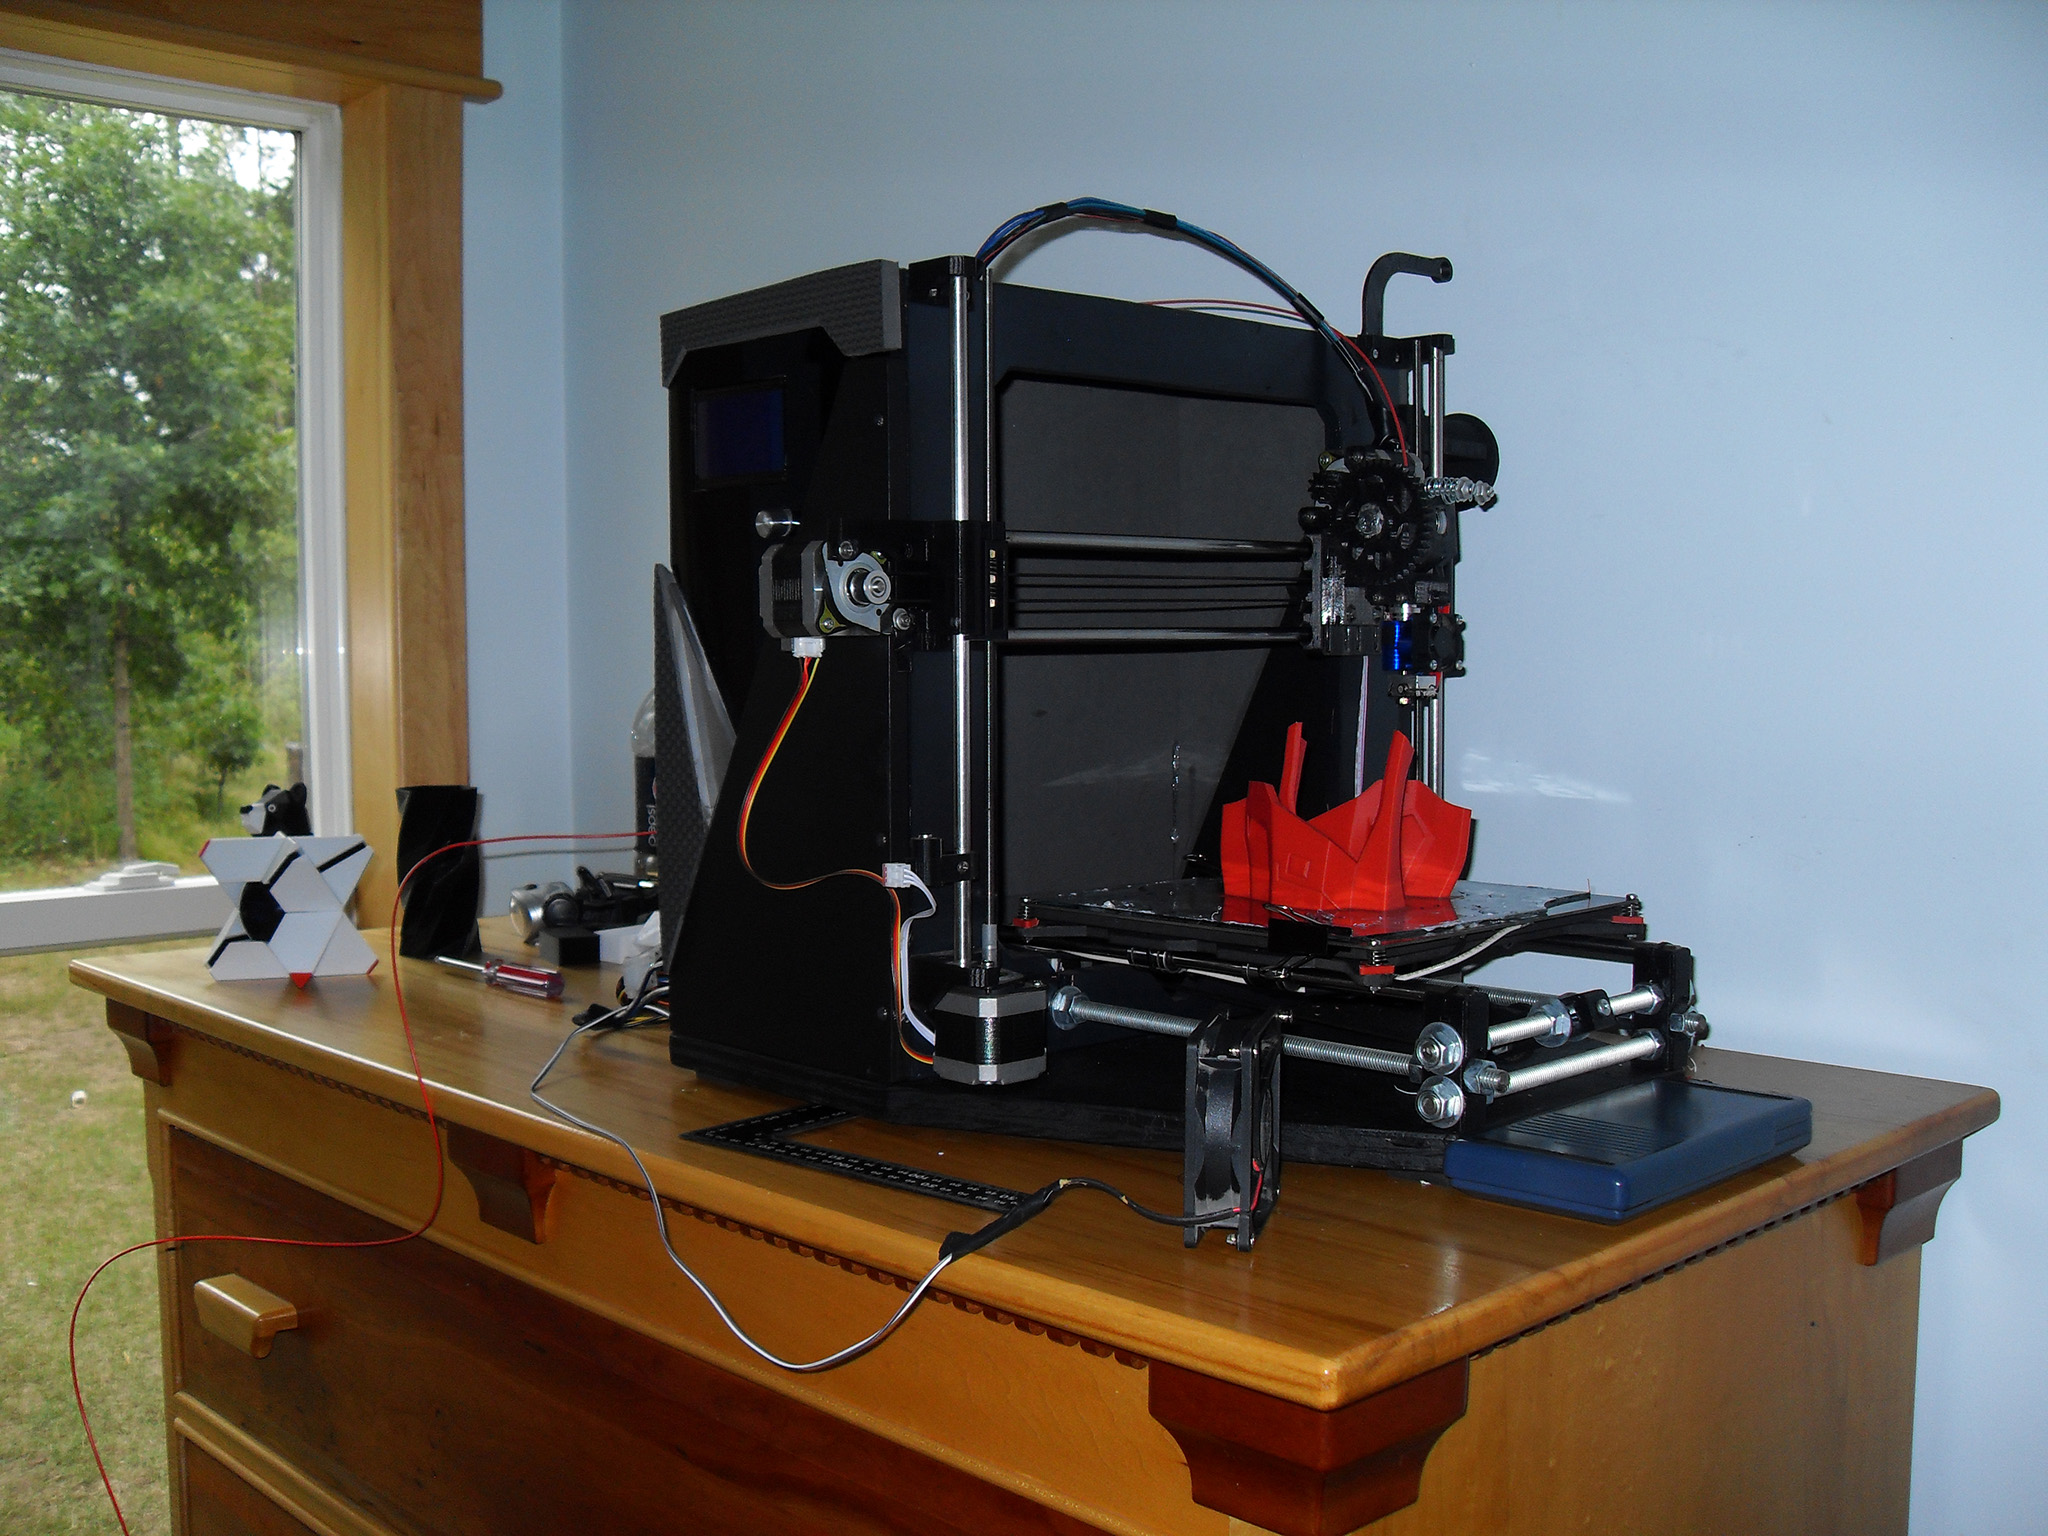 printer at work.jpg